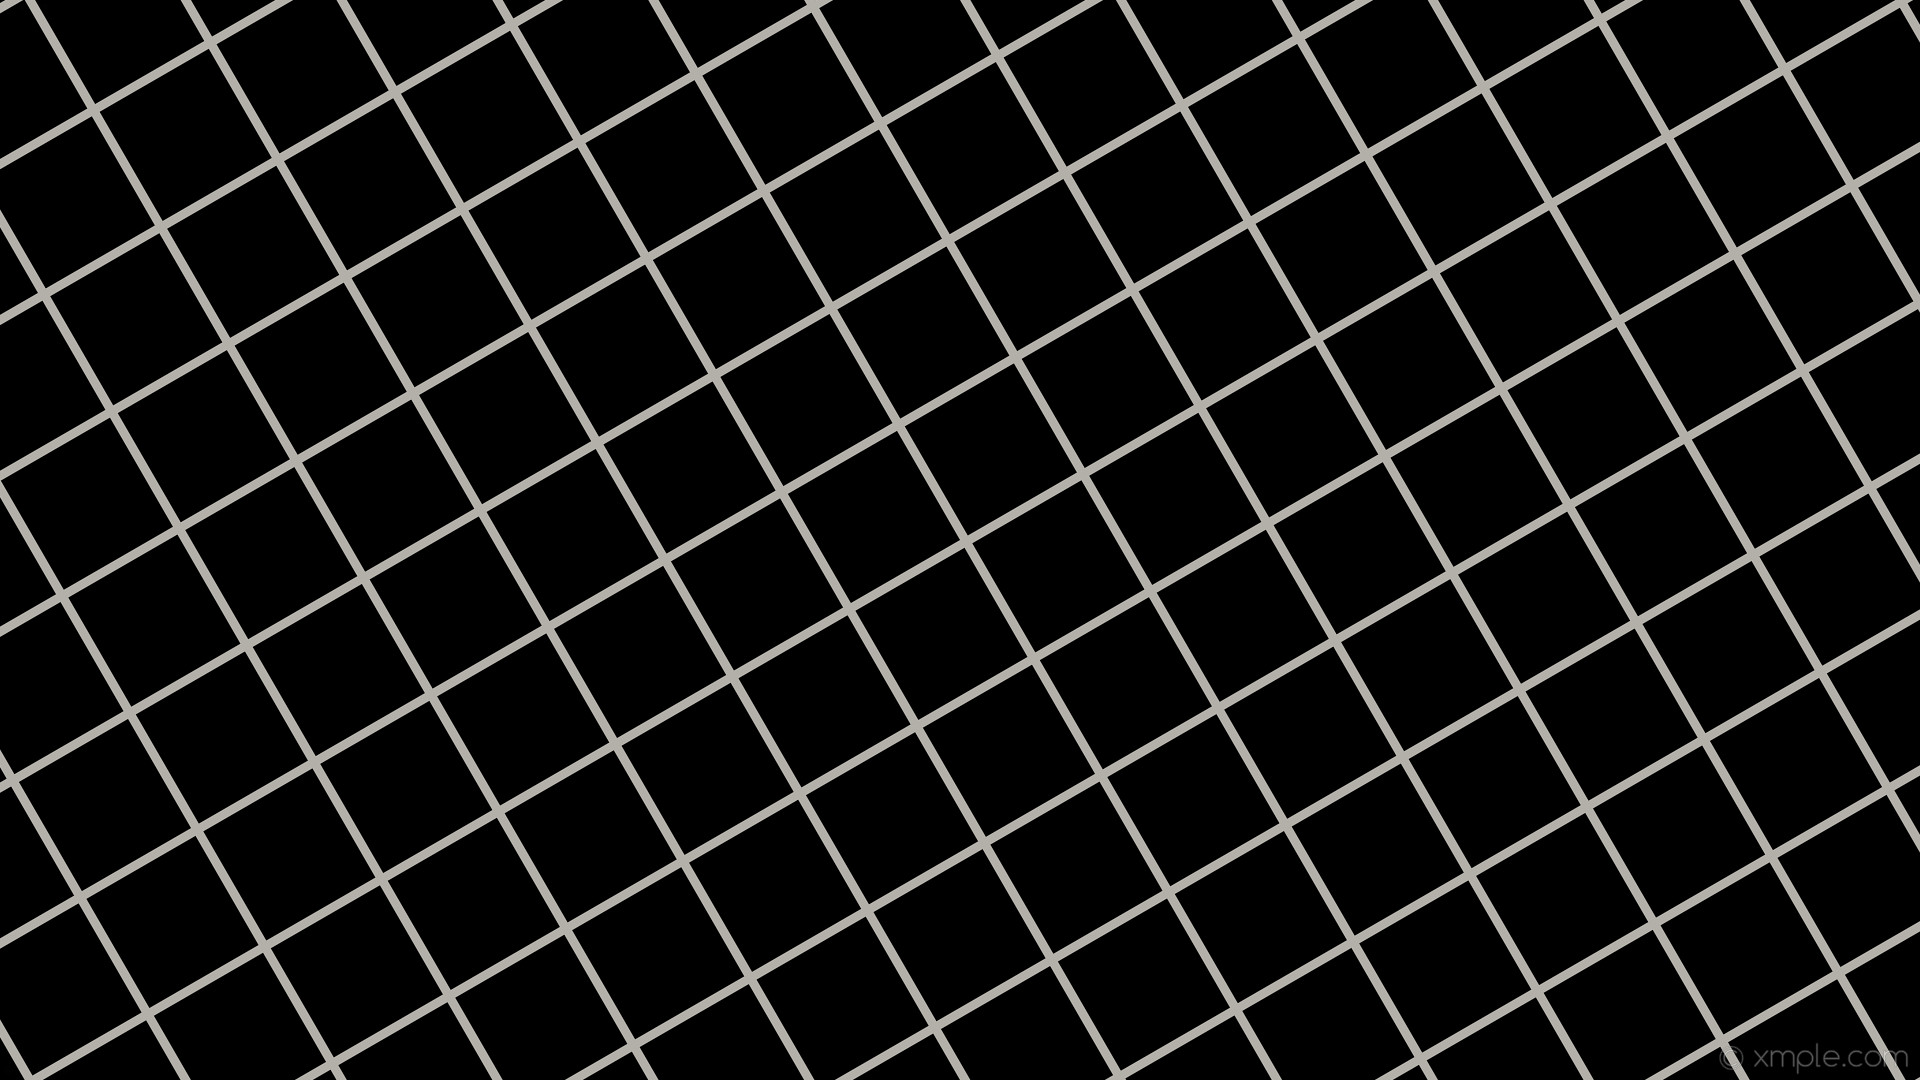 Res: 1920x1080, wallpaper graph paper black white grid floral white #000000 #fffaf0 30° 9px  135px